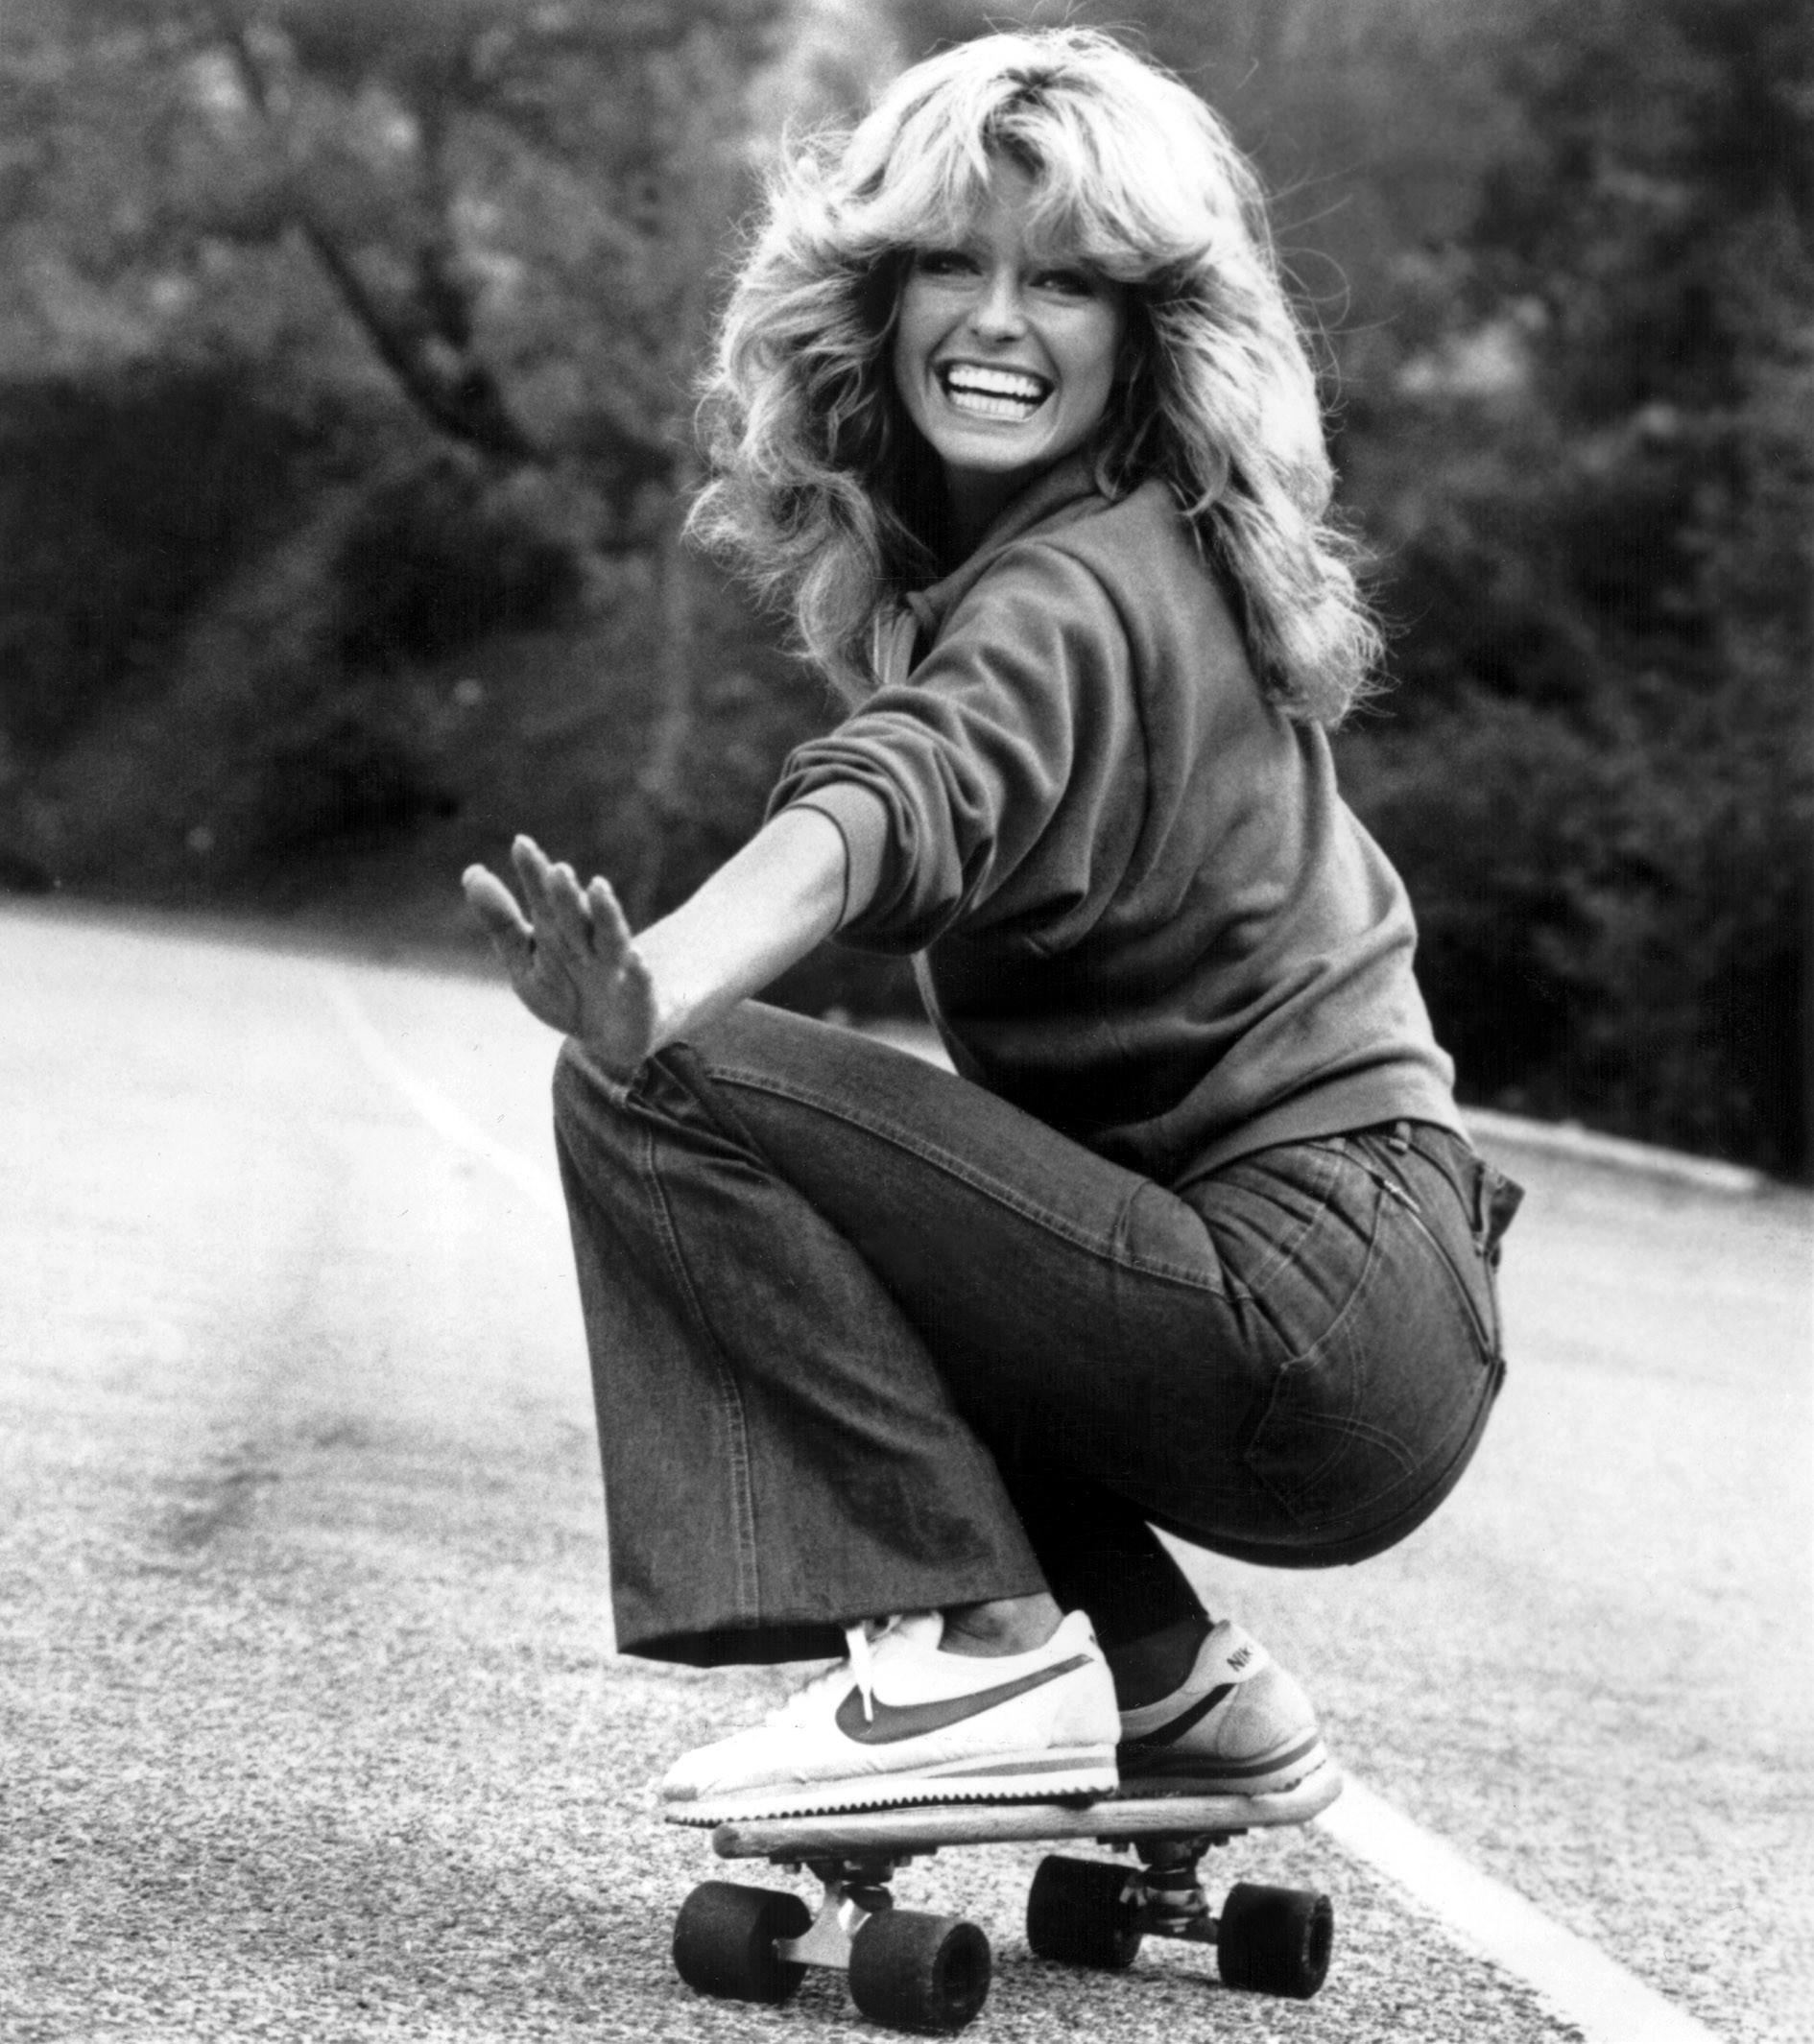 The 1970s: A jeans-clad Farrah Fawcett flaunts her assets.